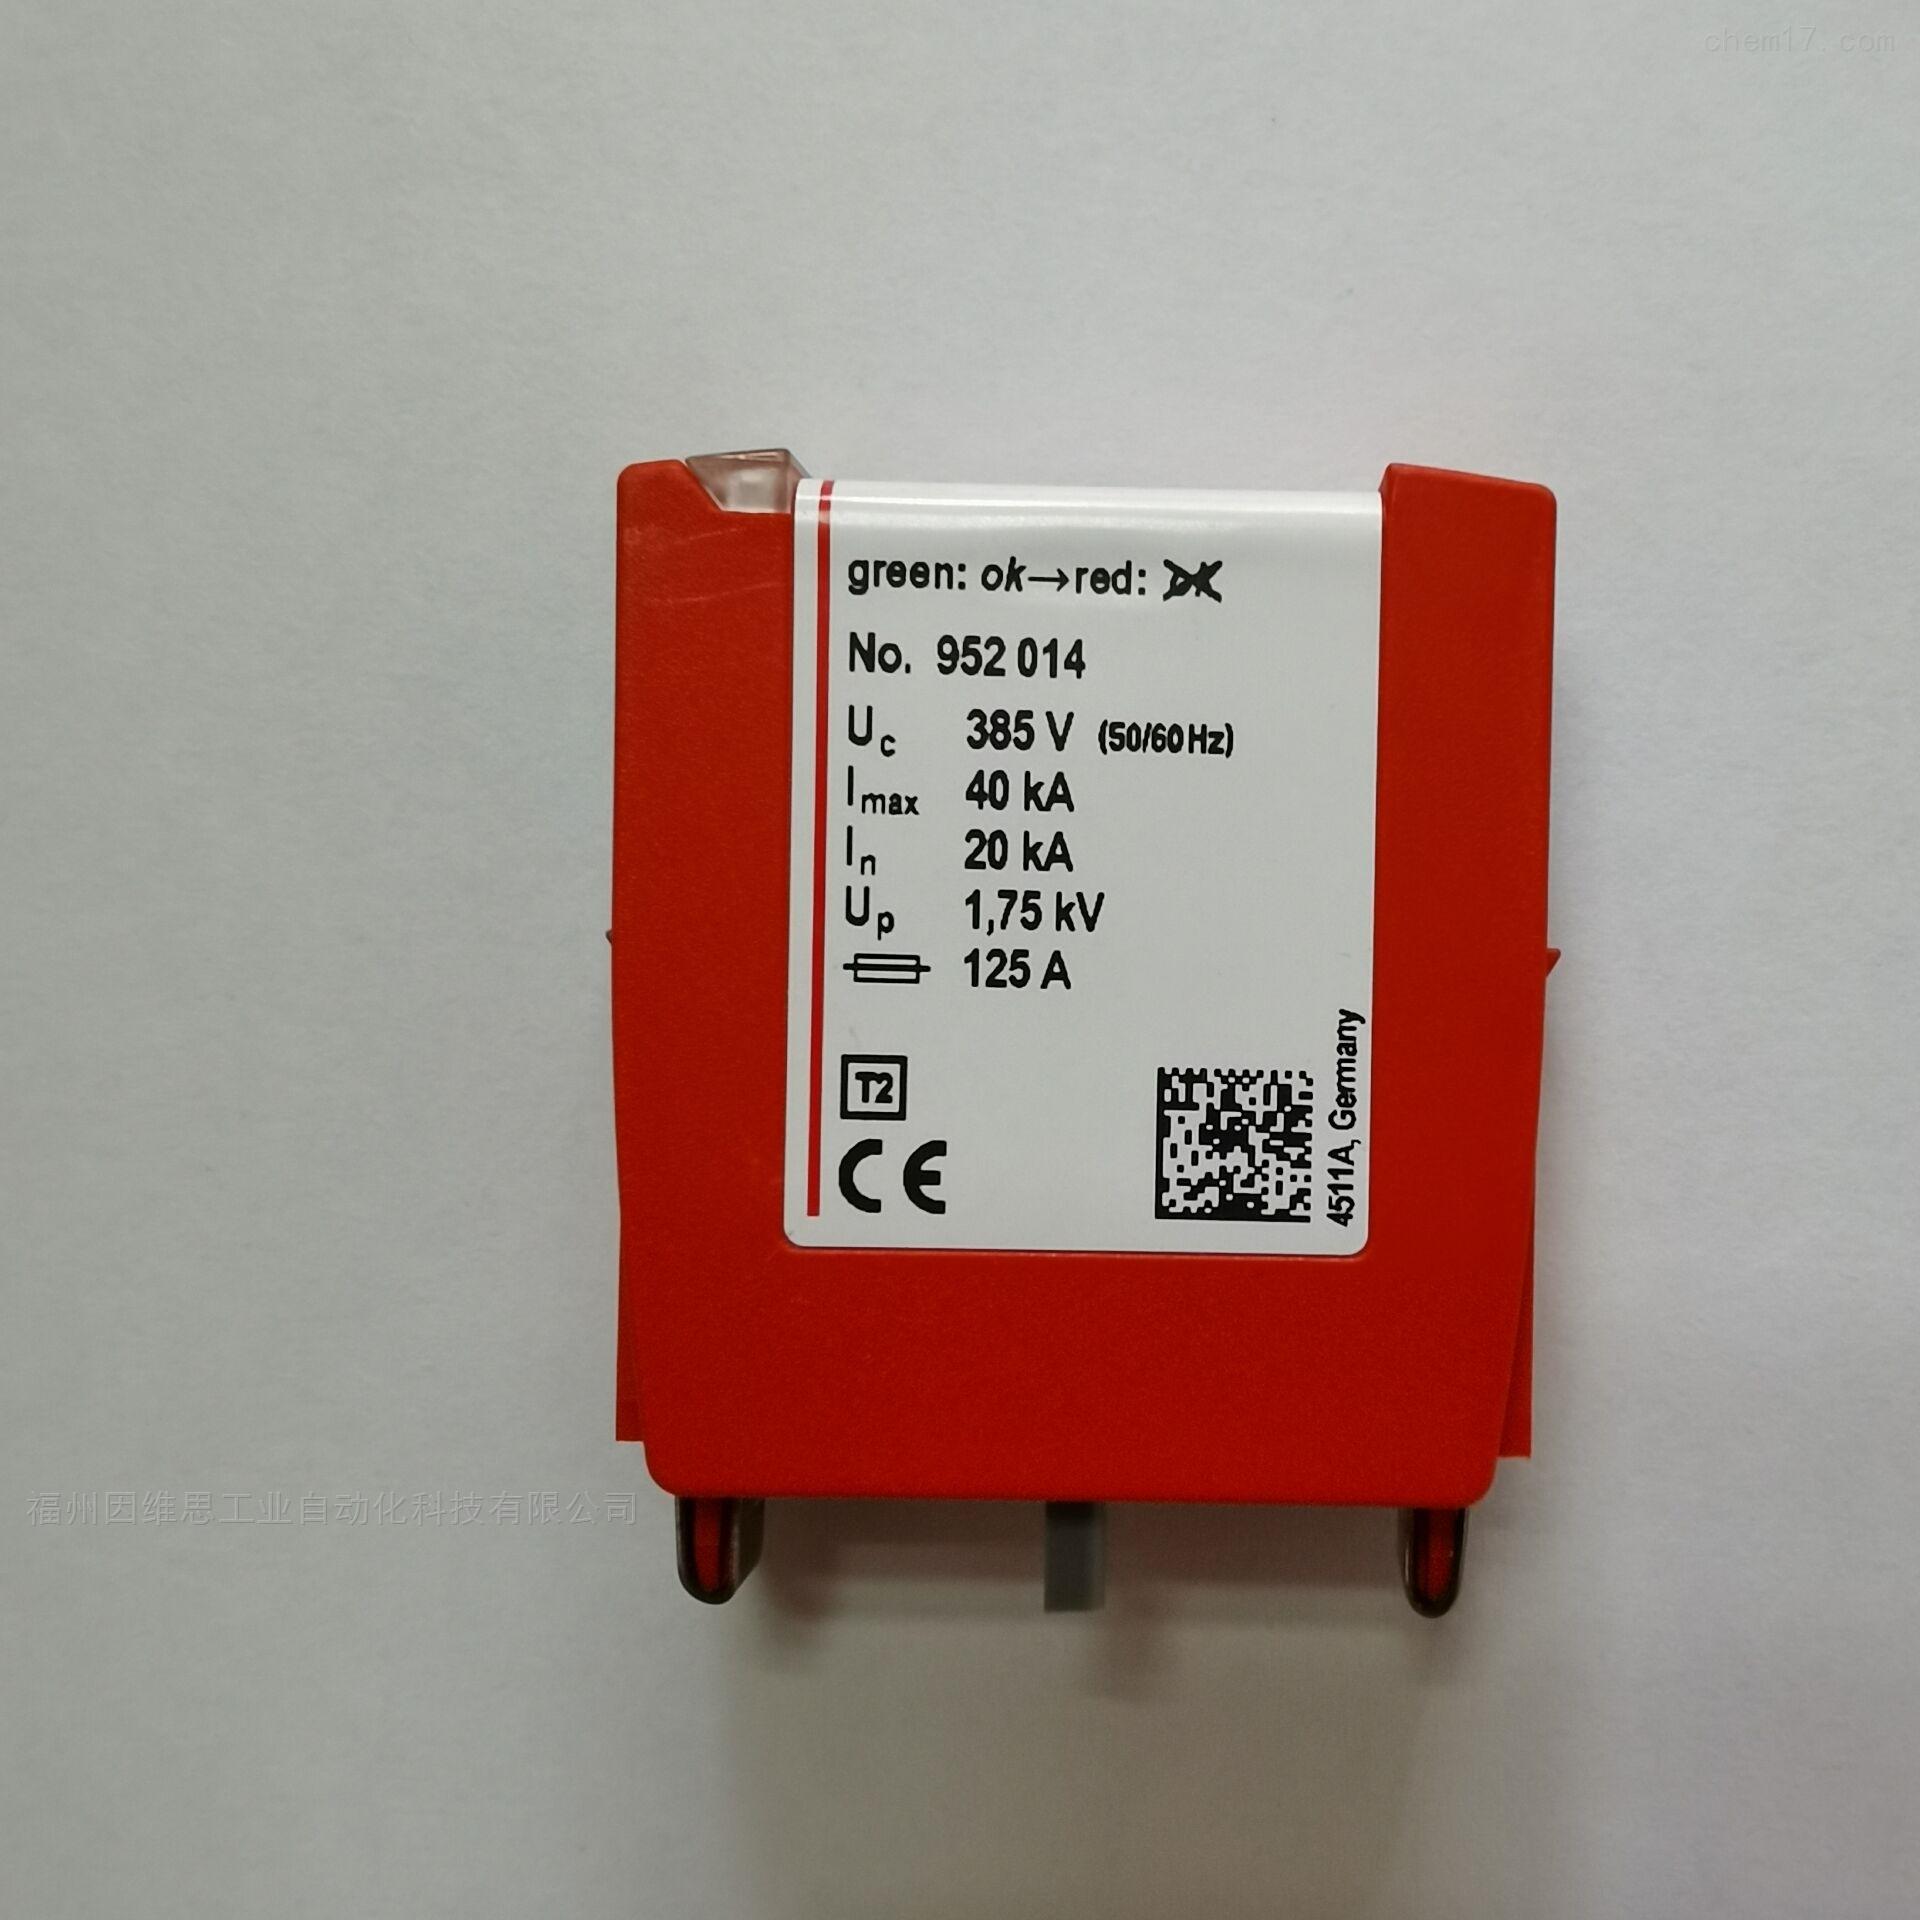 DEHN浪涌保护插头DG MOD PV 75防雷器热卖